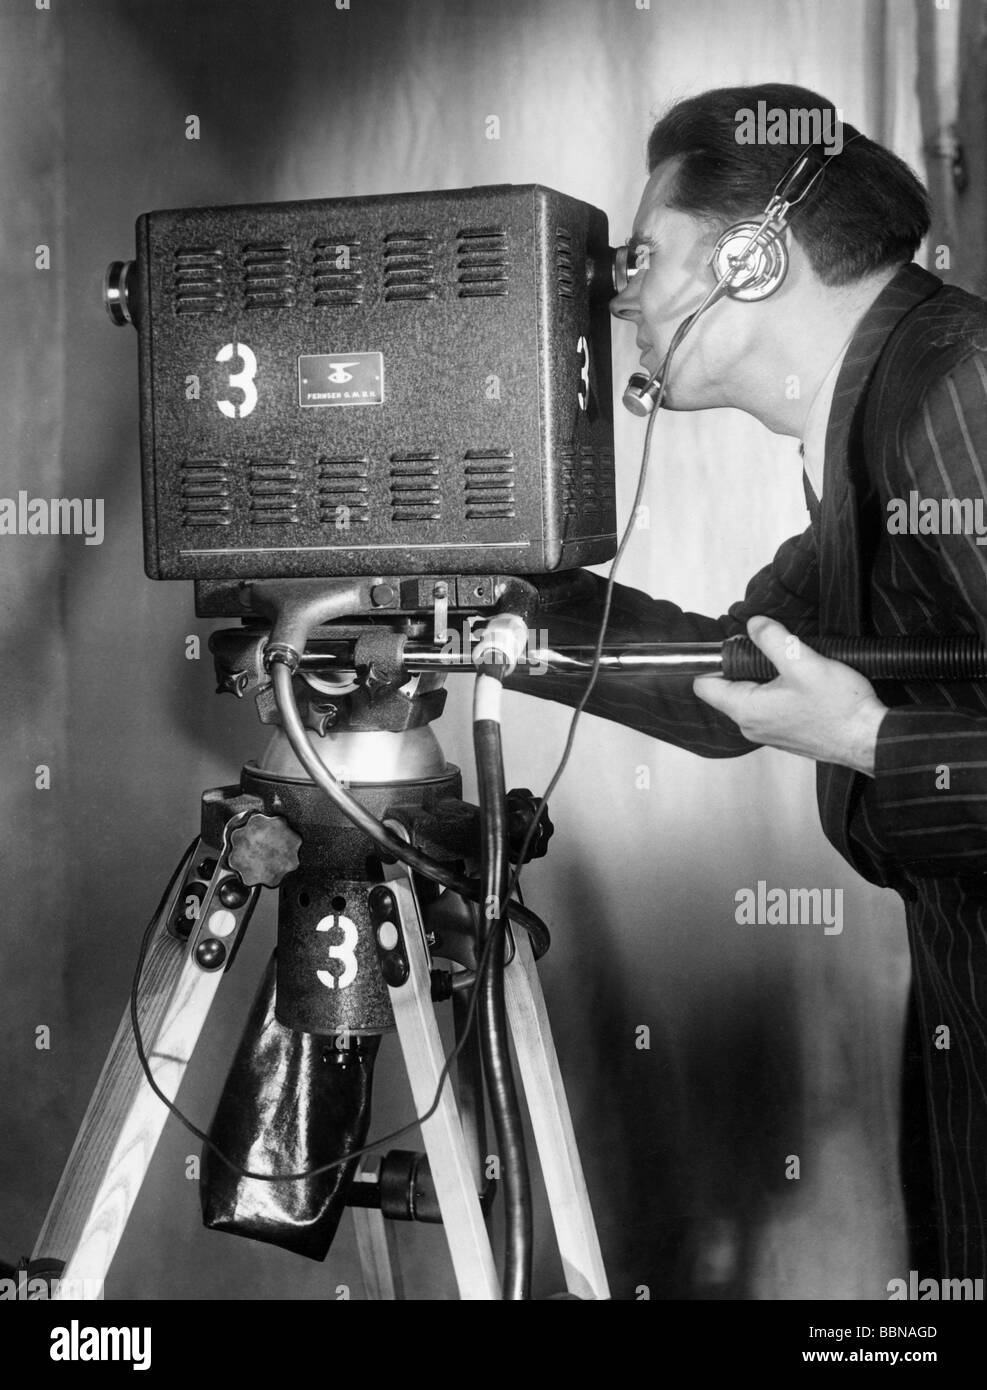 Broadcast, a televisão, a Technics, filme de câmera Fernseh Gmbh, Darmstadt, Nordwestdeutscher Rundfunk Imagens de Stock